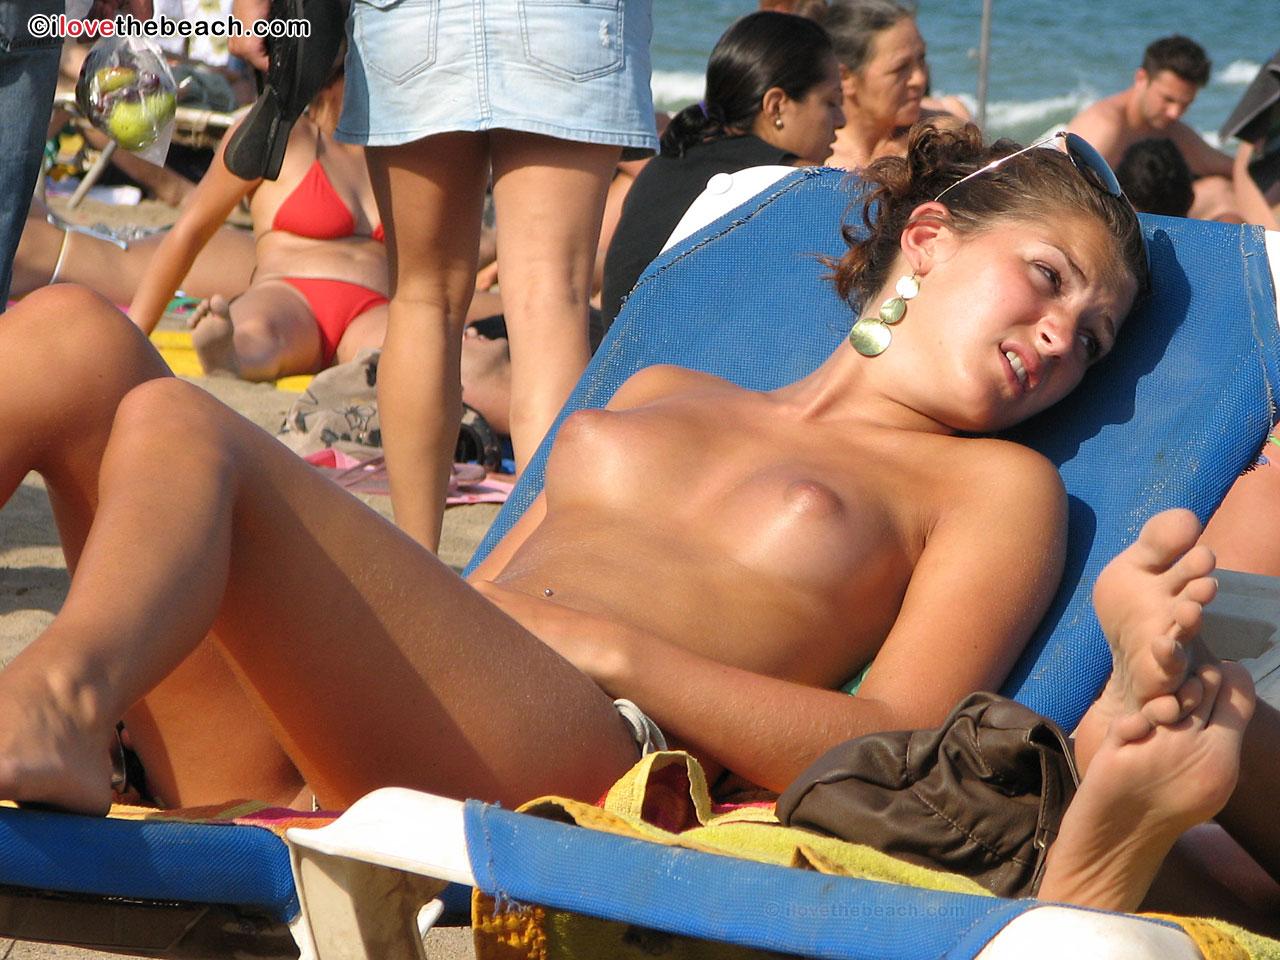 Beach jamaican women nude